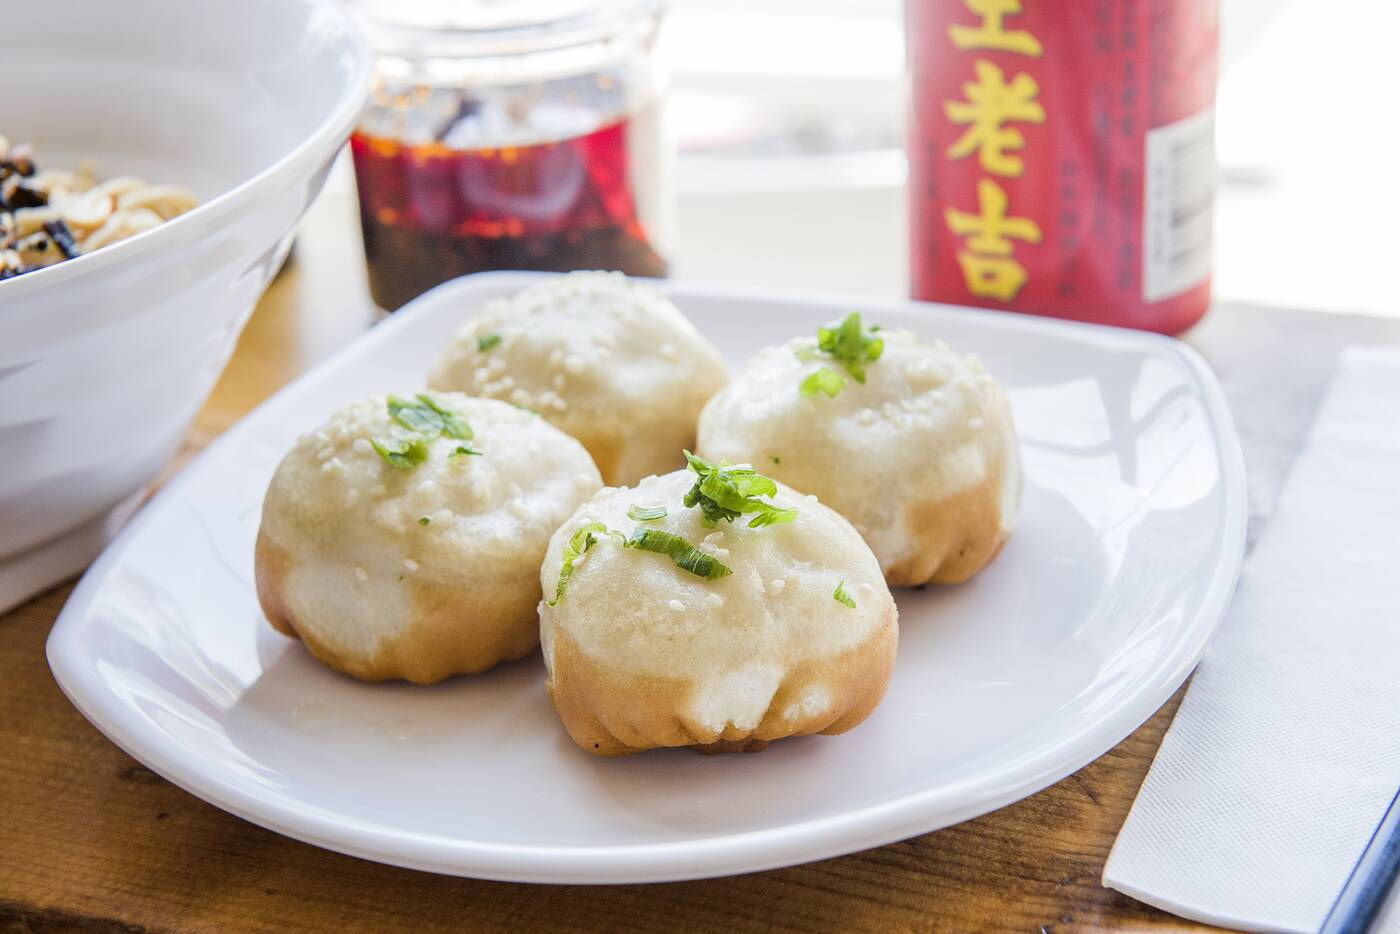 toronto soup dumplings